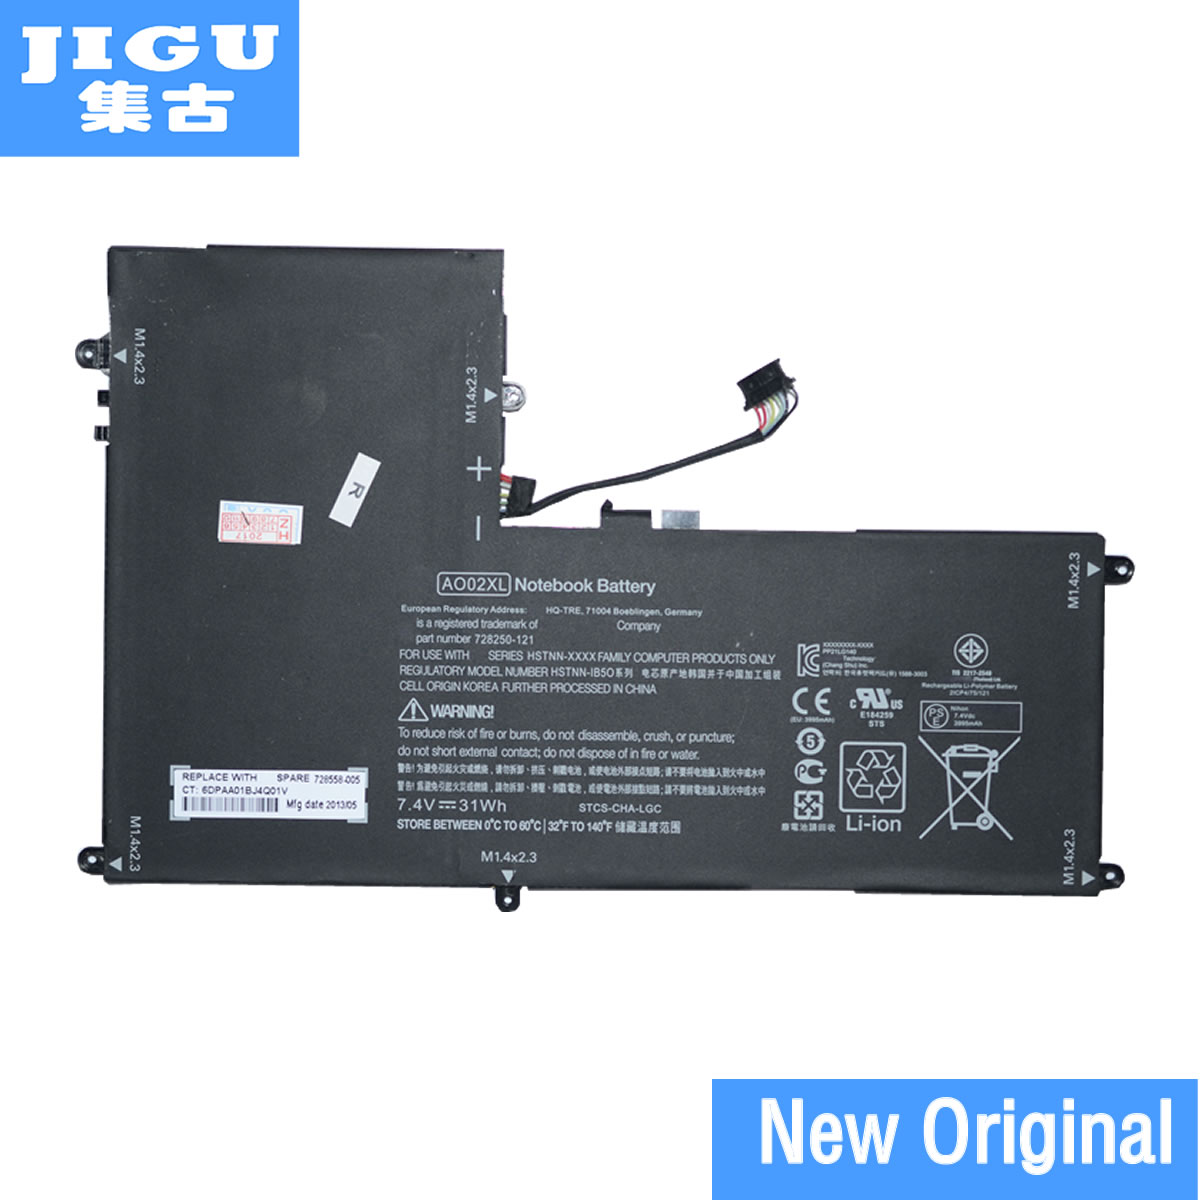 JIGU Original AO02XL Tablet Battery For HP For ElitePad 1000 G2 Tablet HSTNN-LB5O HSTNN-C75C HSTNN-IB5Q 728558-005 728250-421JIGU Original AO02XL Tablet Battery For HP For ElitePad 1000 G2 Tablet HSTNN-LB5O HSTNN-C75C HSTNN-IB5Q 728558-005 728250-421